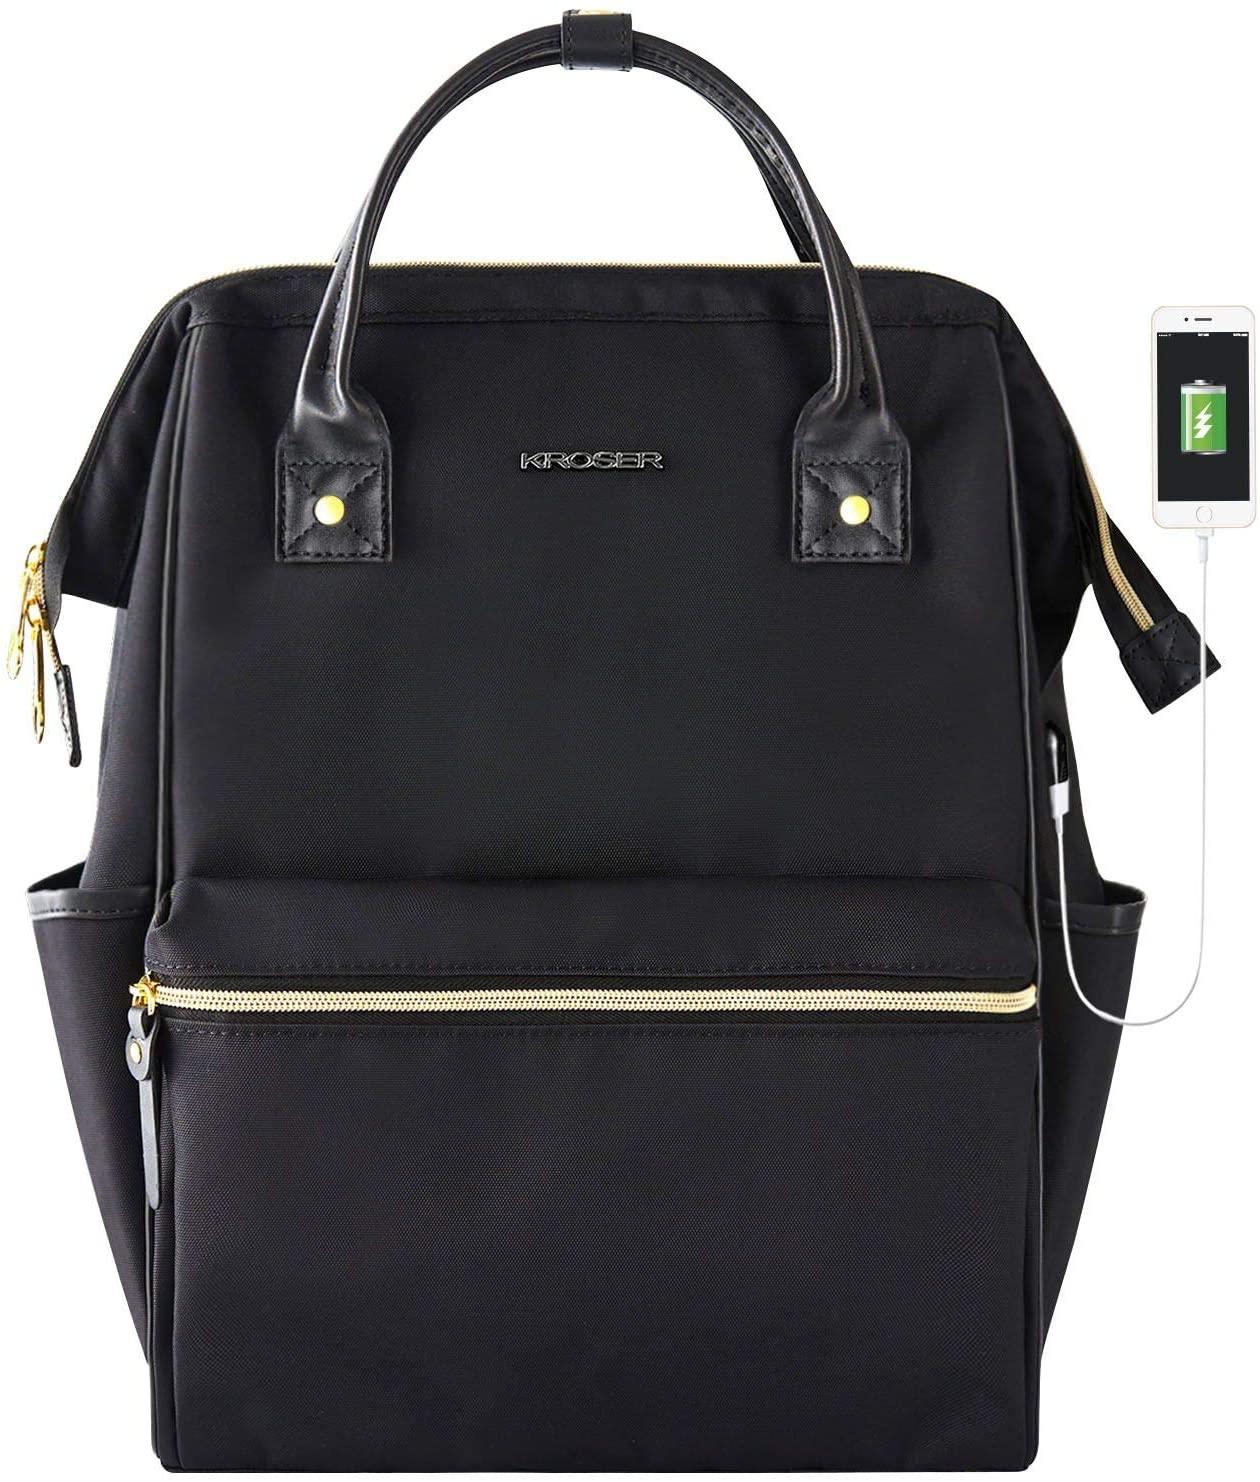 Laptop bag with USB port